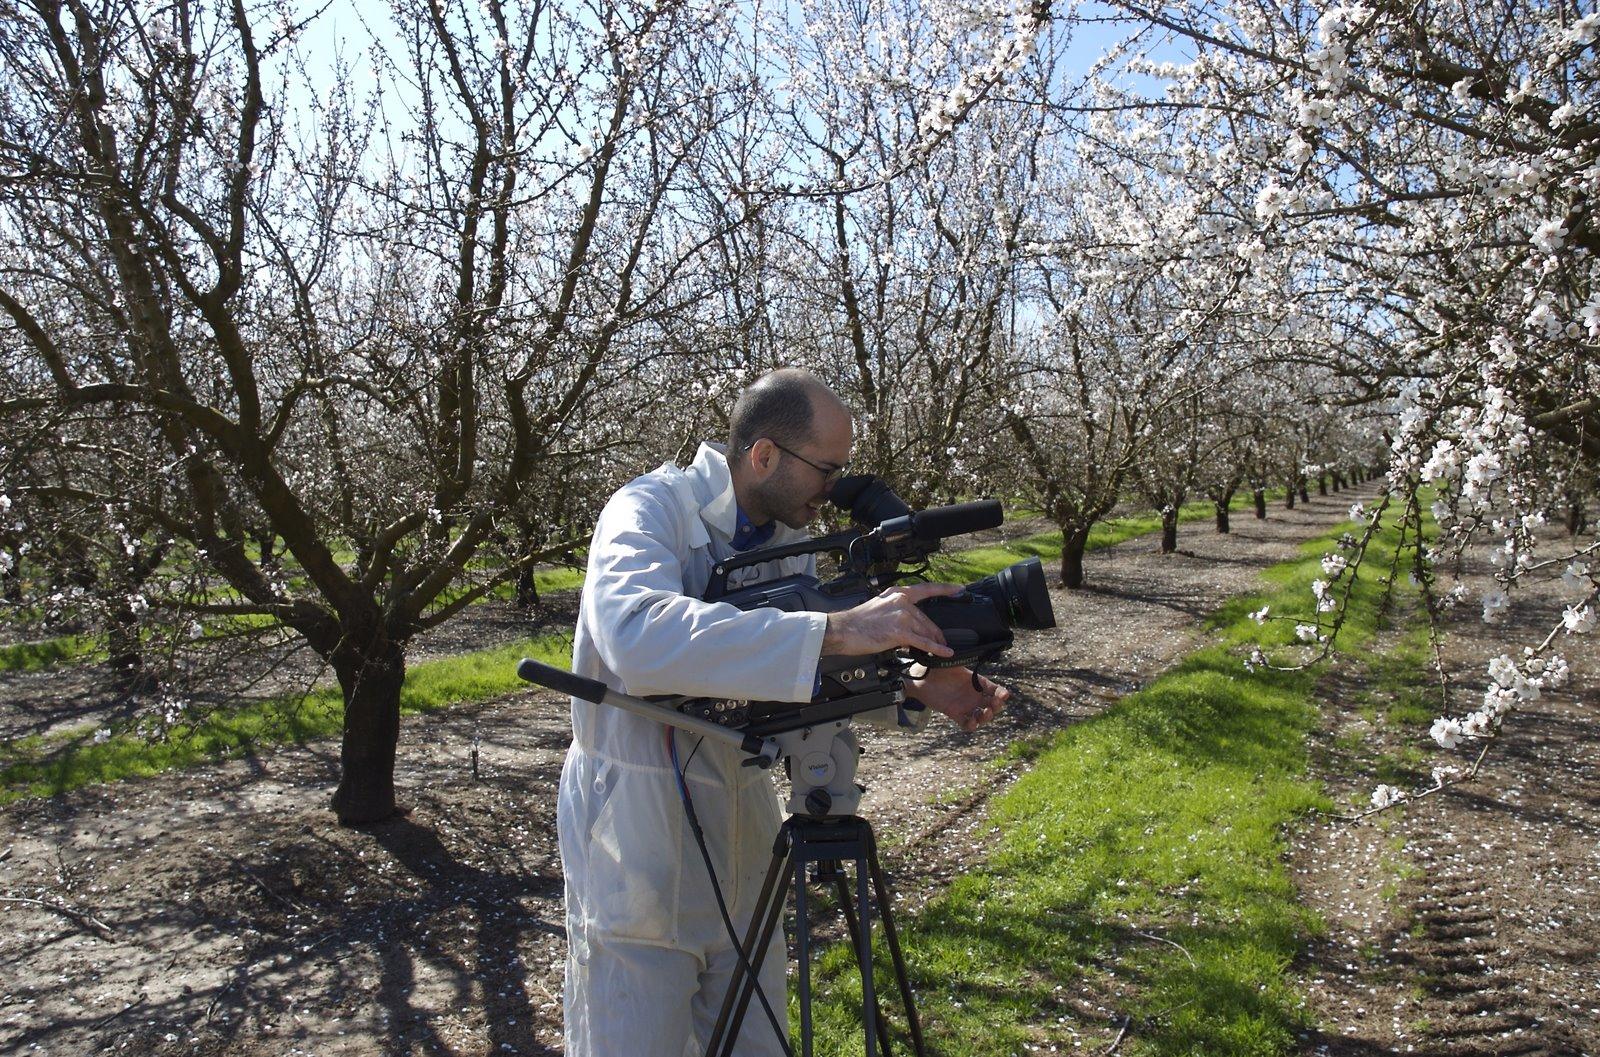 [josh+in+orchard.jpg]